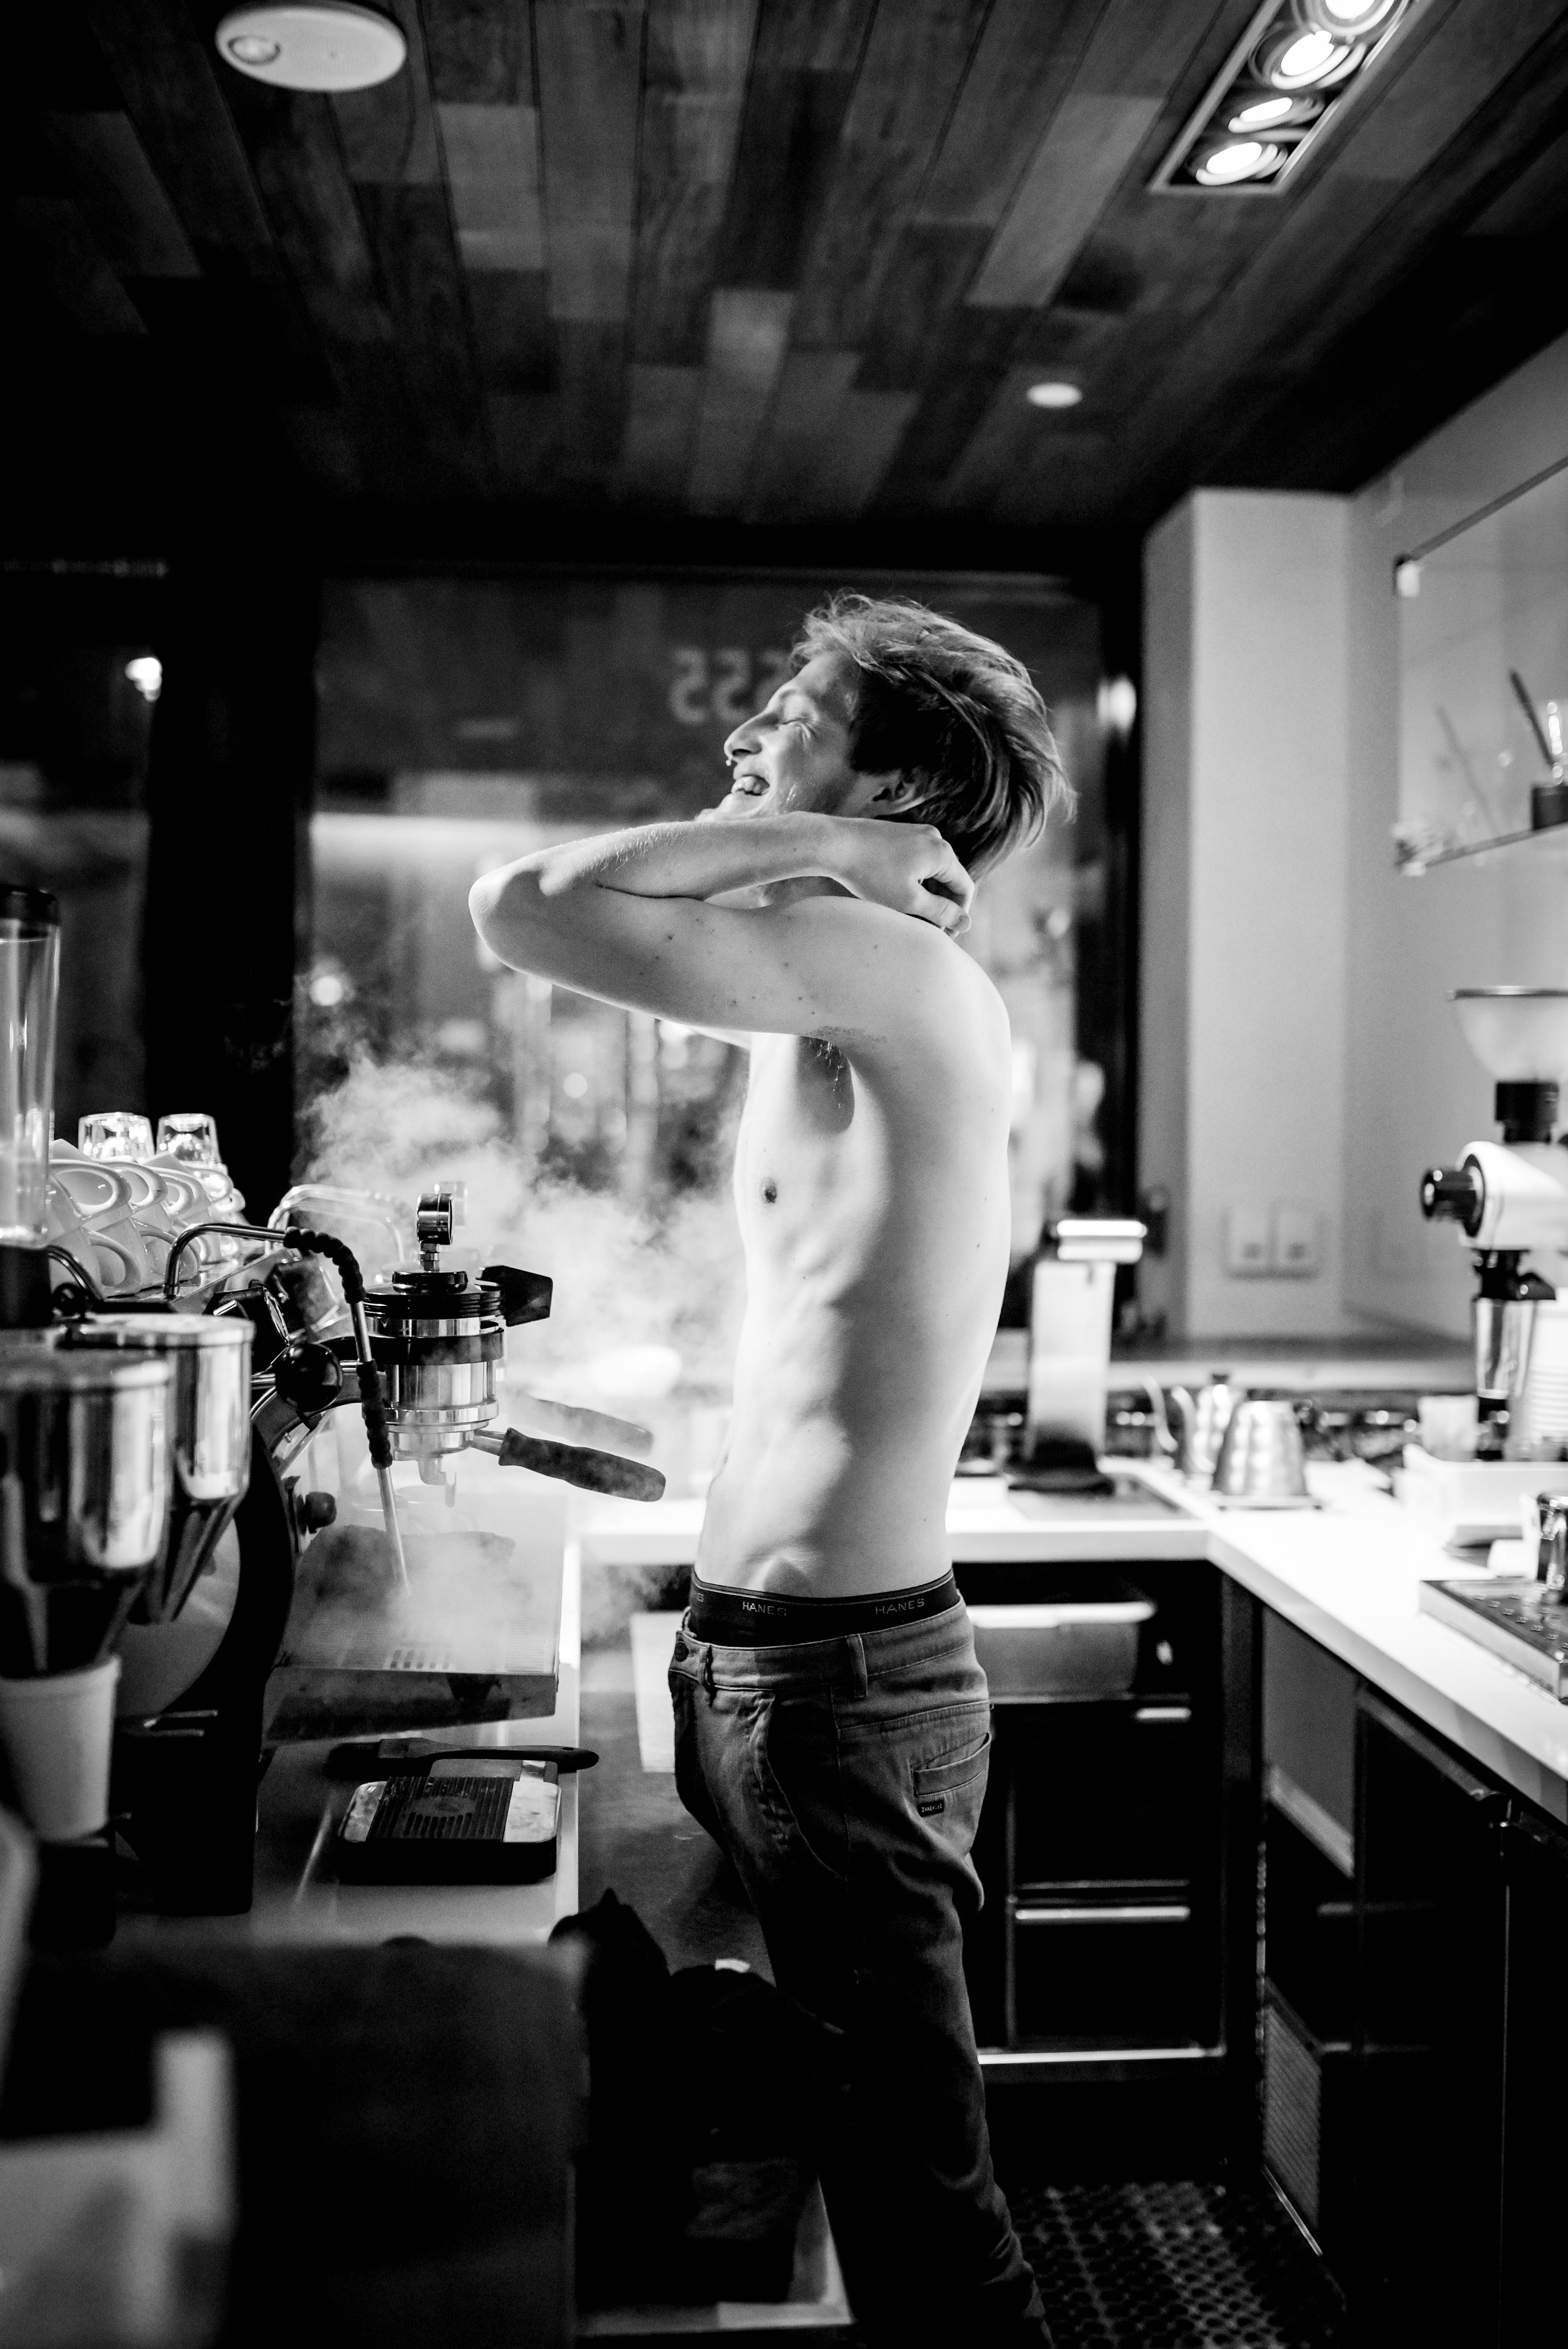 sexy-male-hot-shots-baristas-denver-jmostudio-9295-2